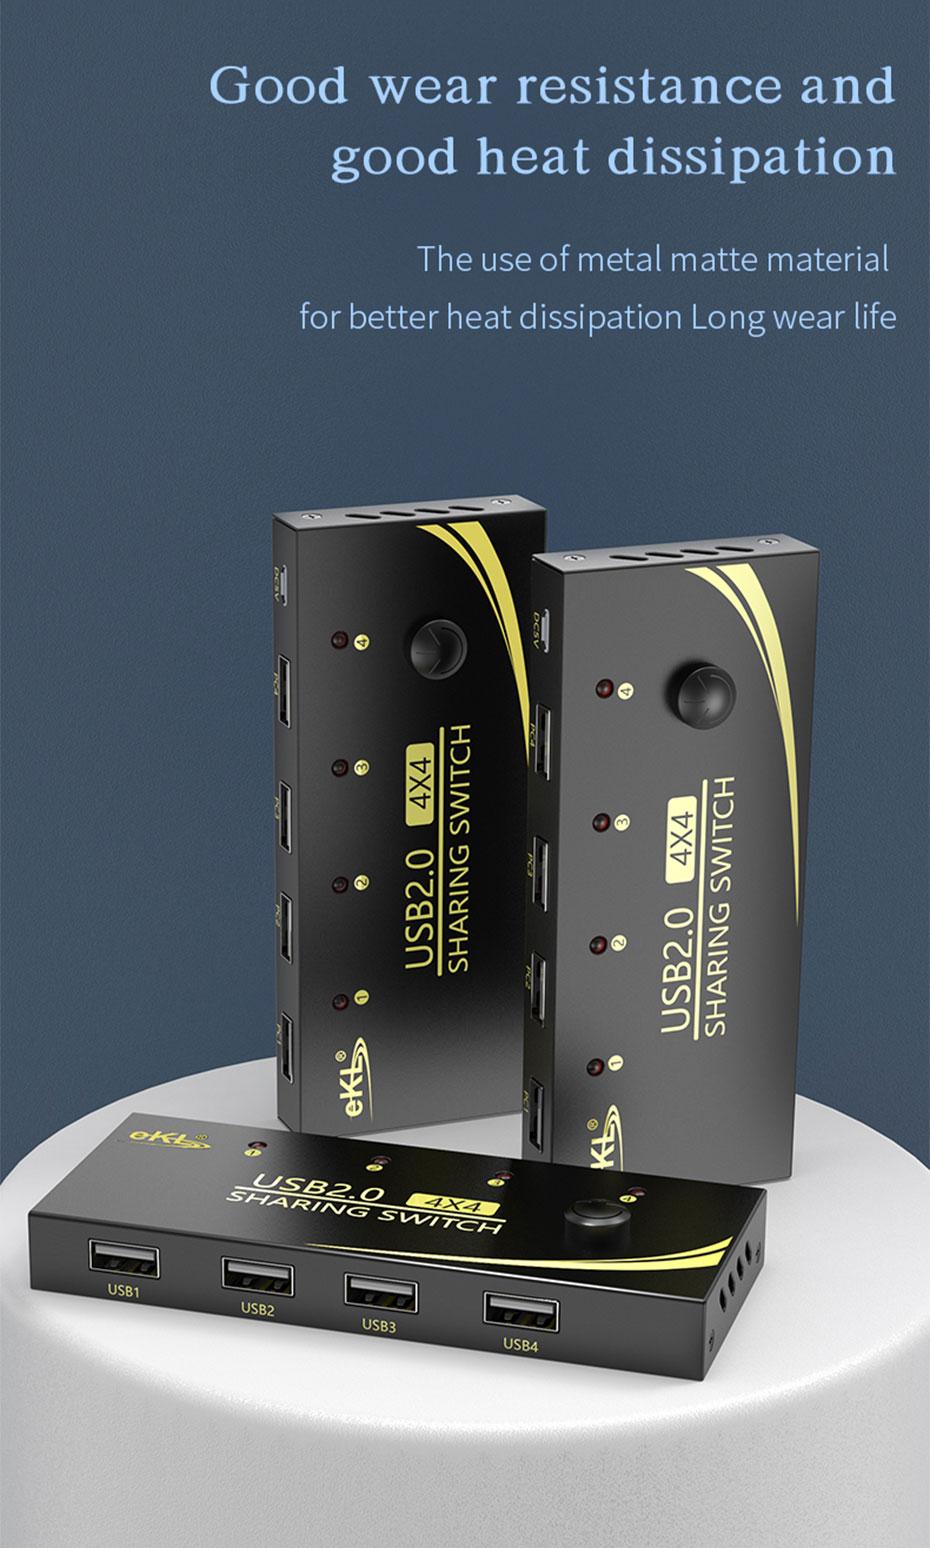 USB sharer U404 uses metal material appearance design